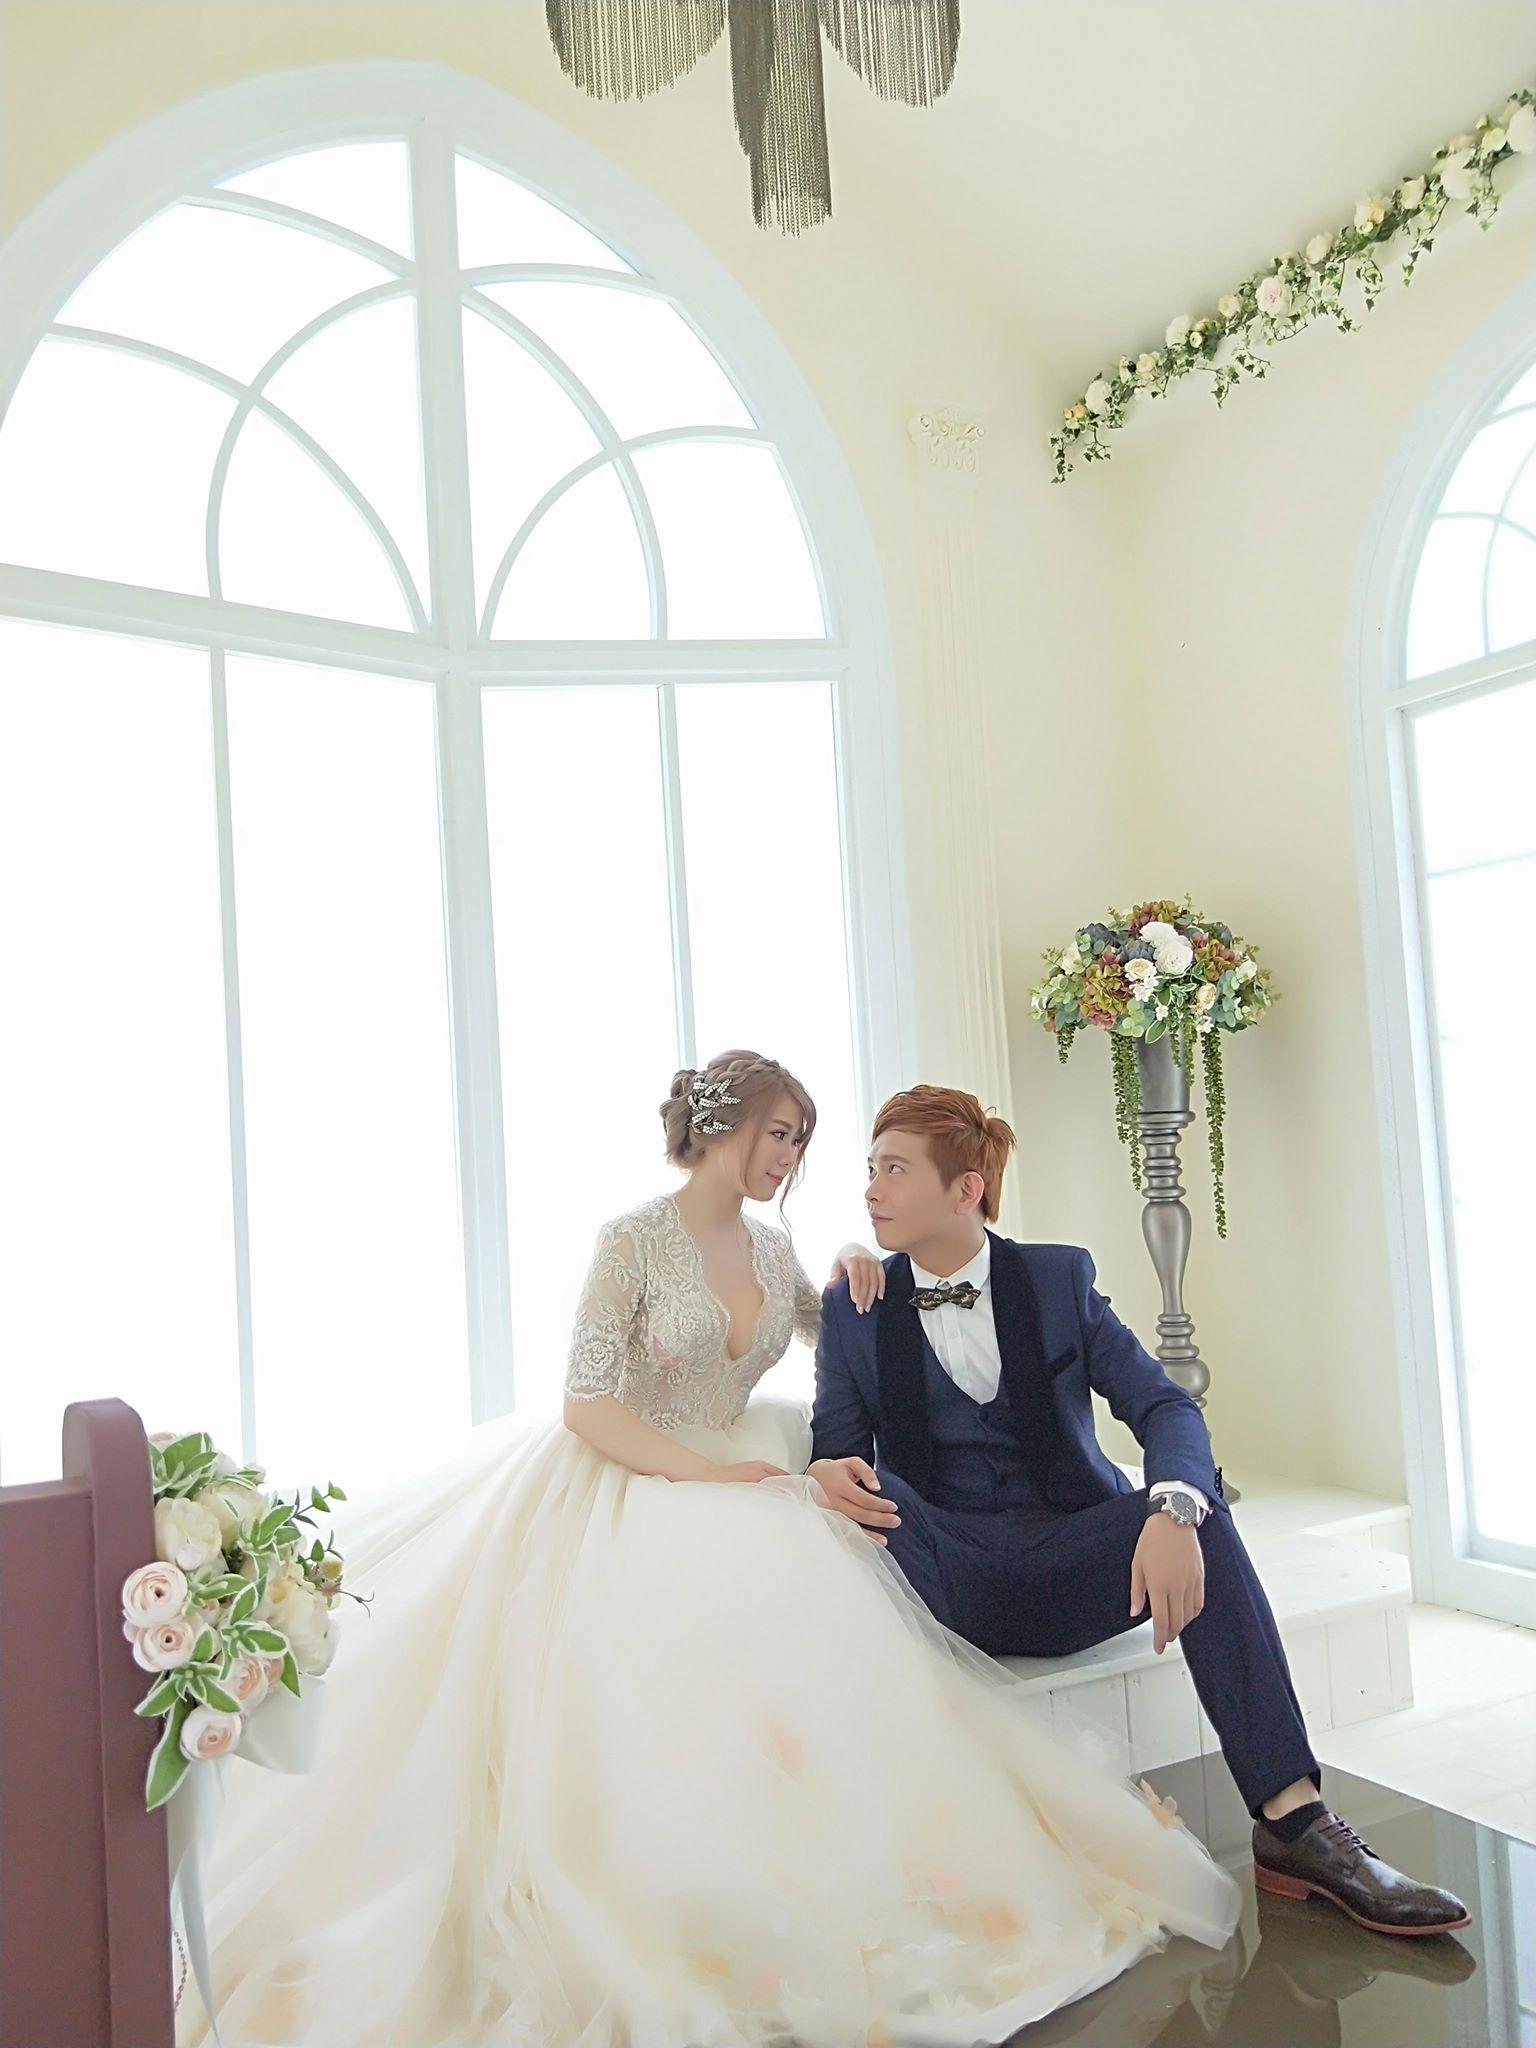 VVNFSWedding自助婚紗自主婚紗方美玉9